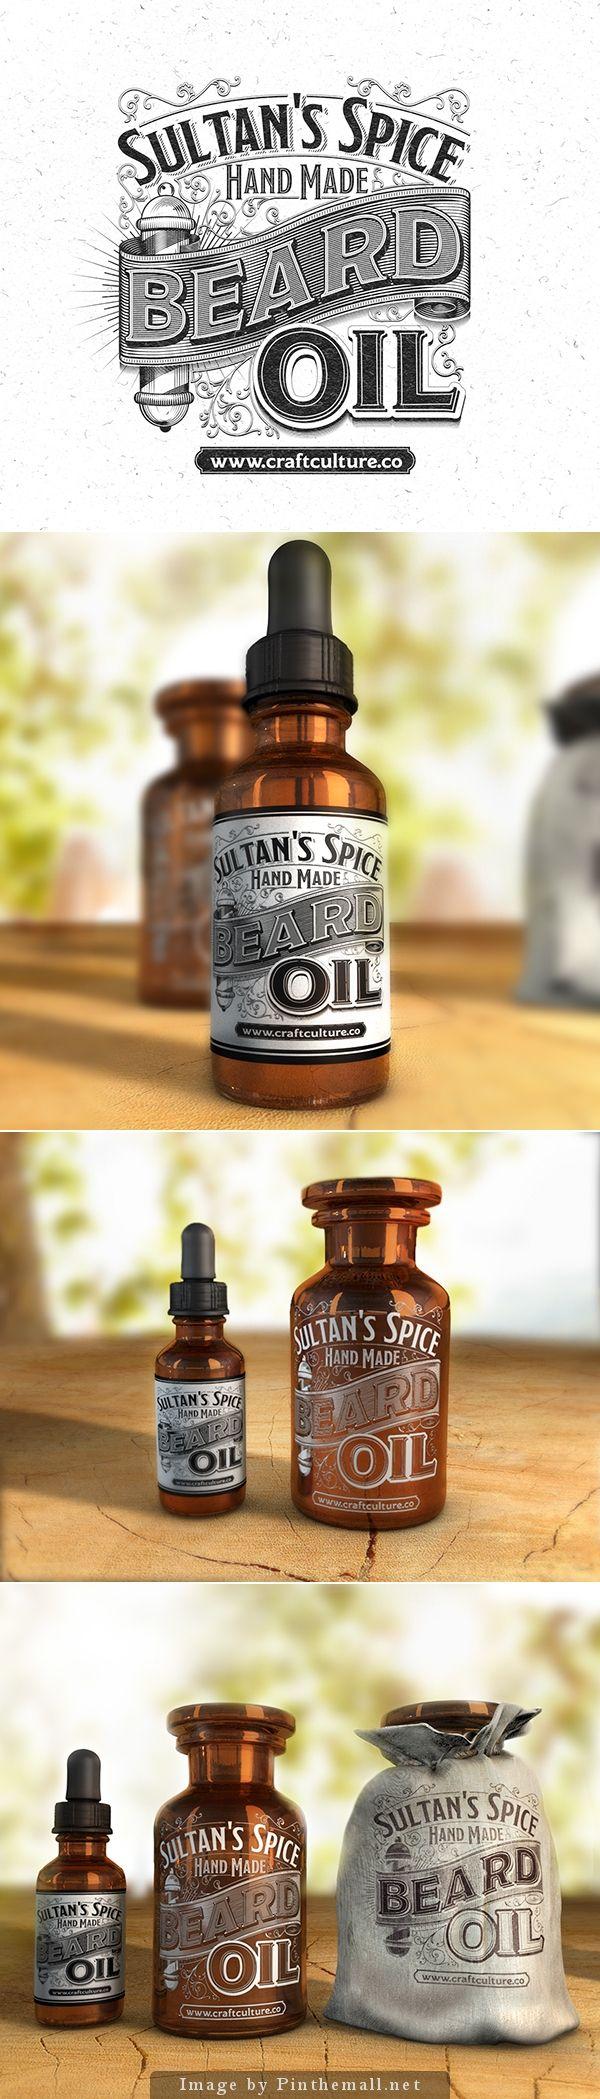 Sultan's Spice Beard Oil by Abraham Garcia